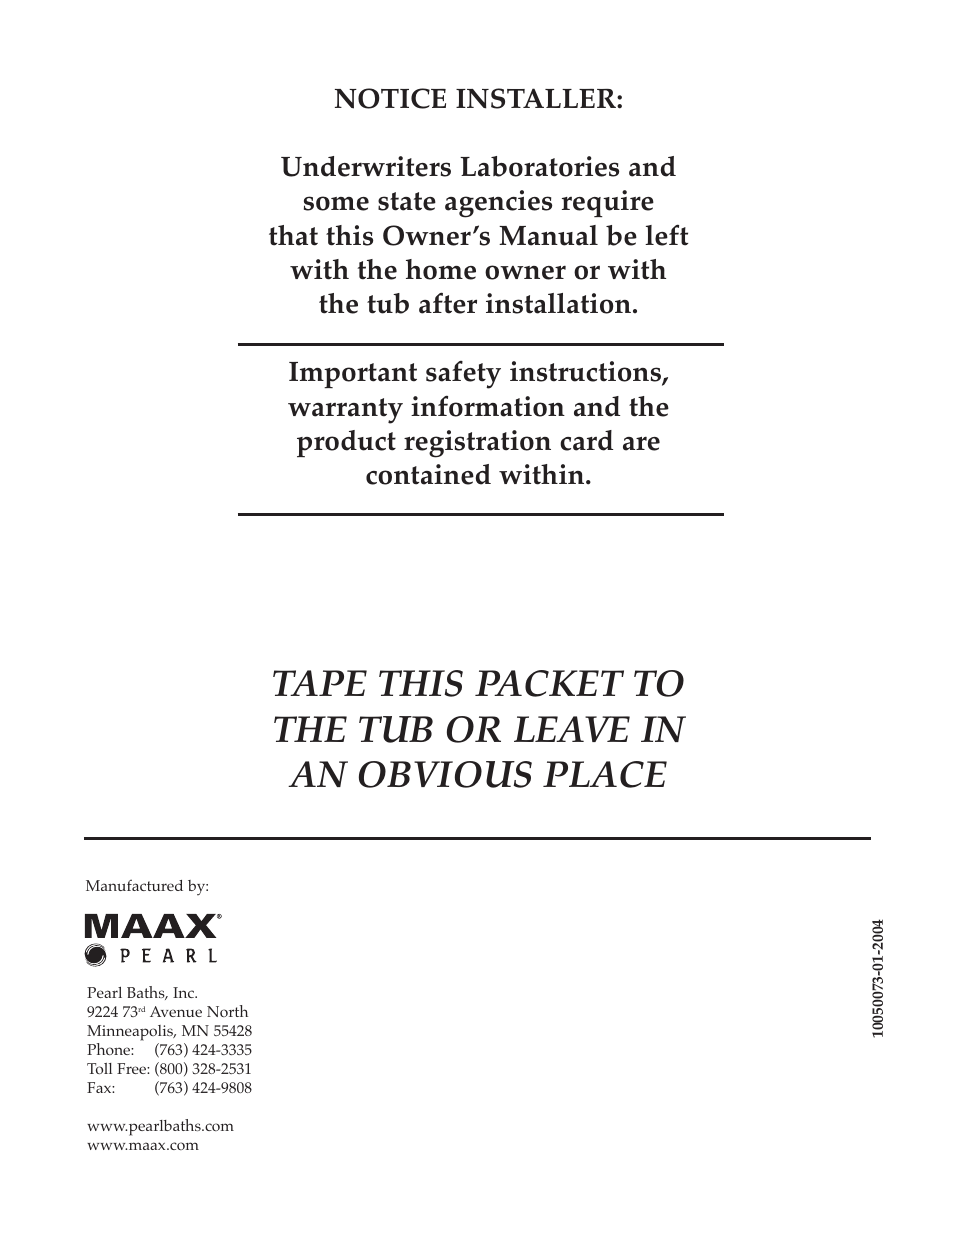 Whirlpool Maax Pearl Hot Tub User Manual | Page 16 / 16